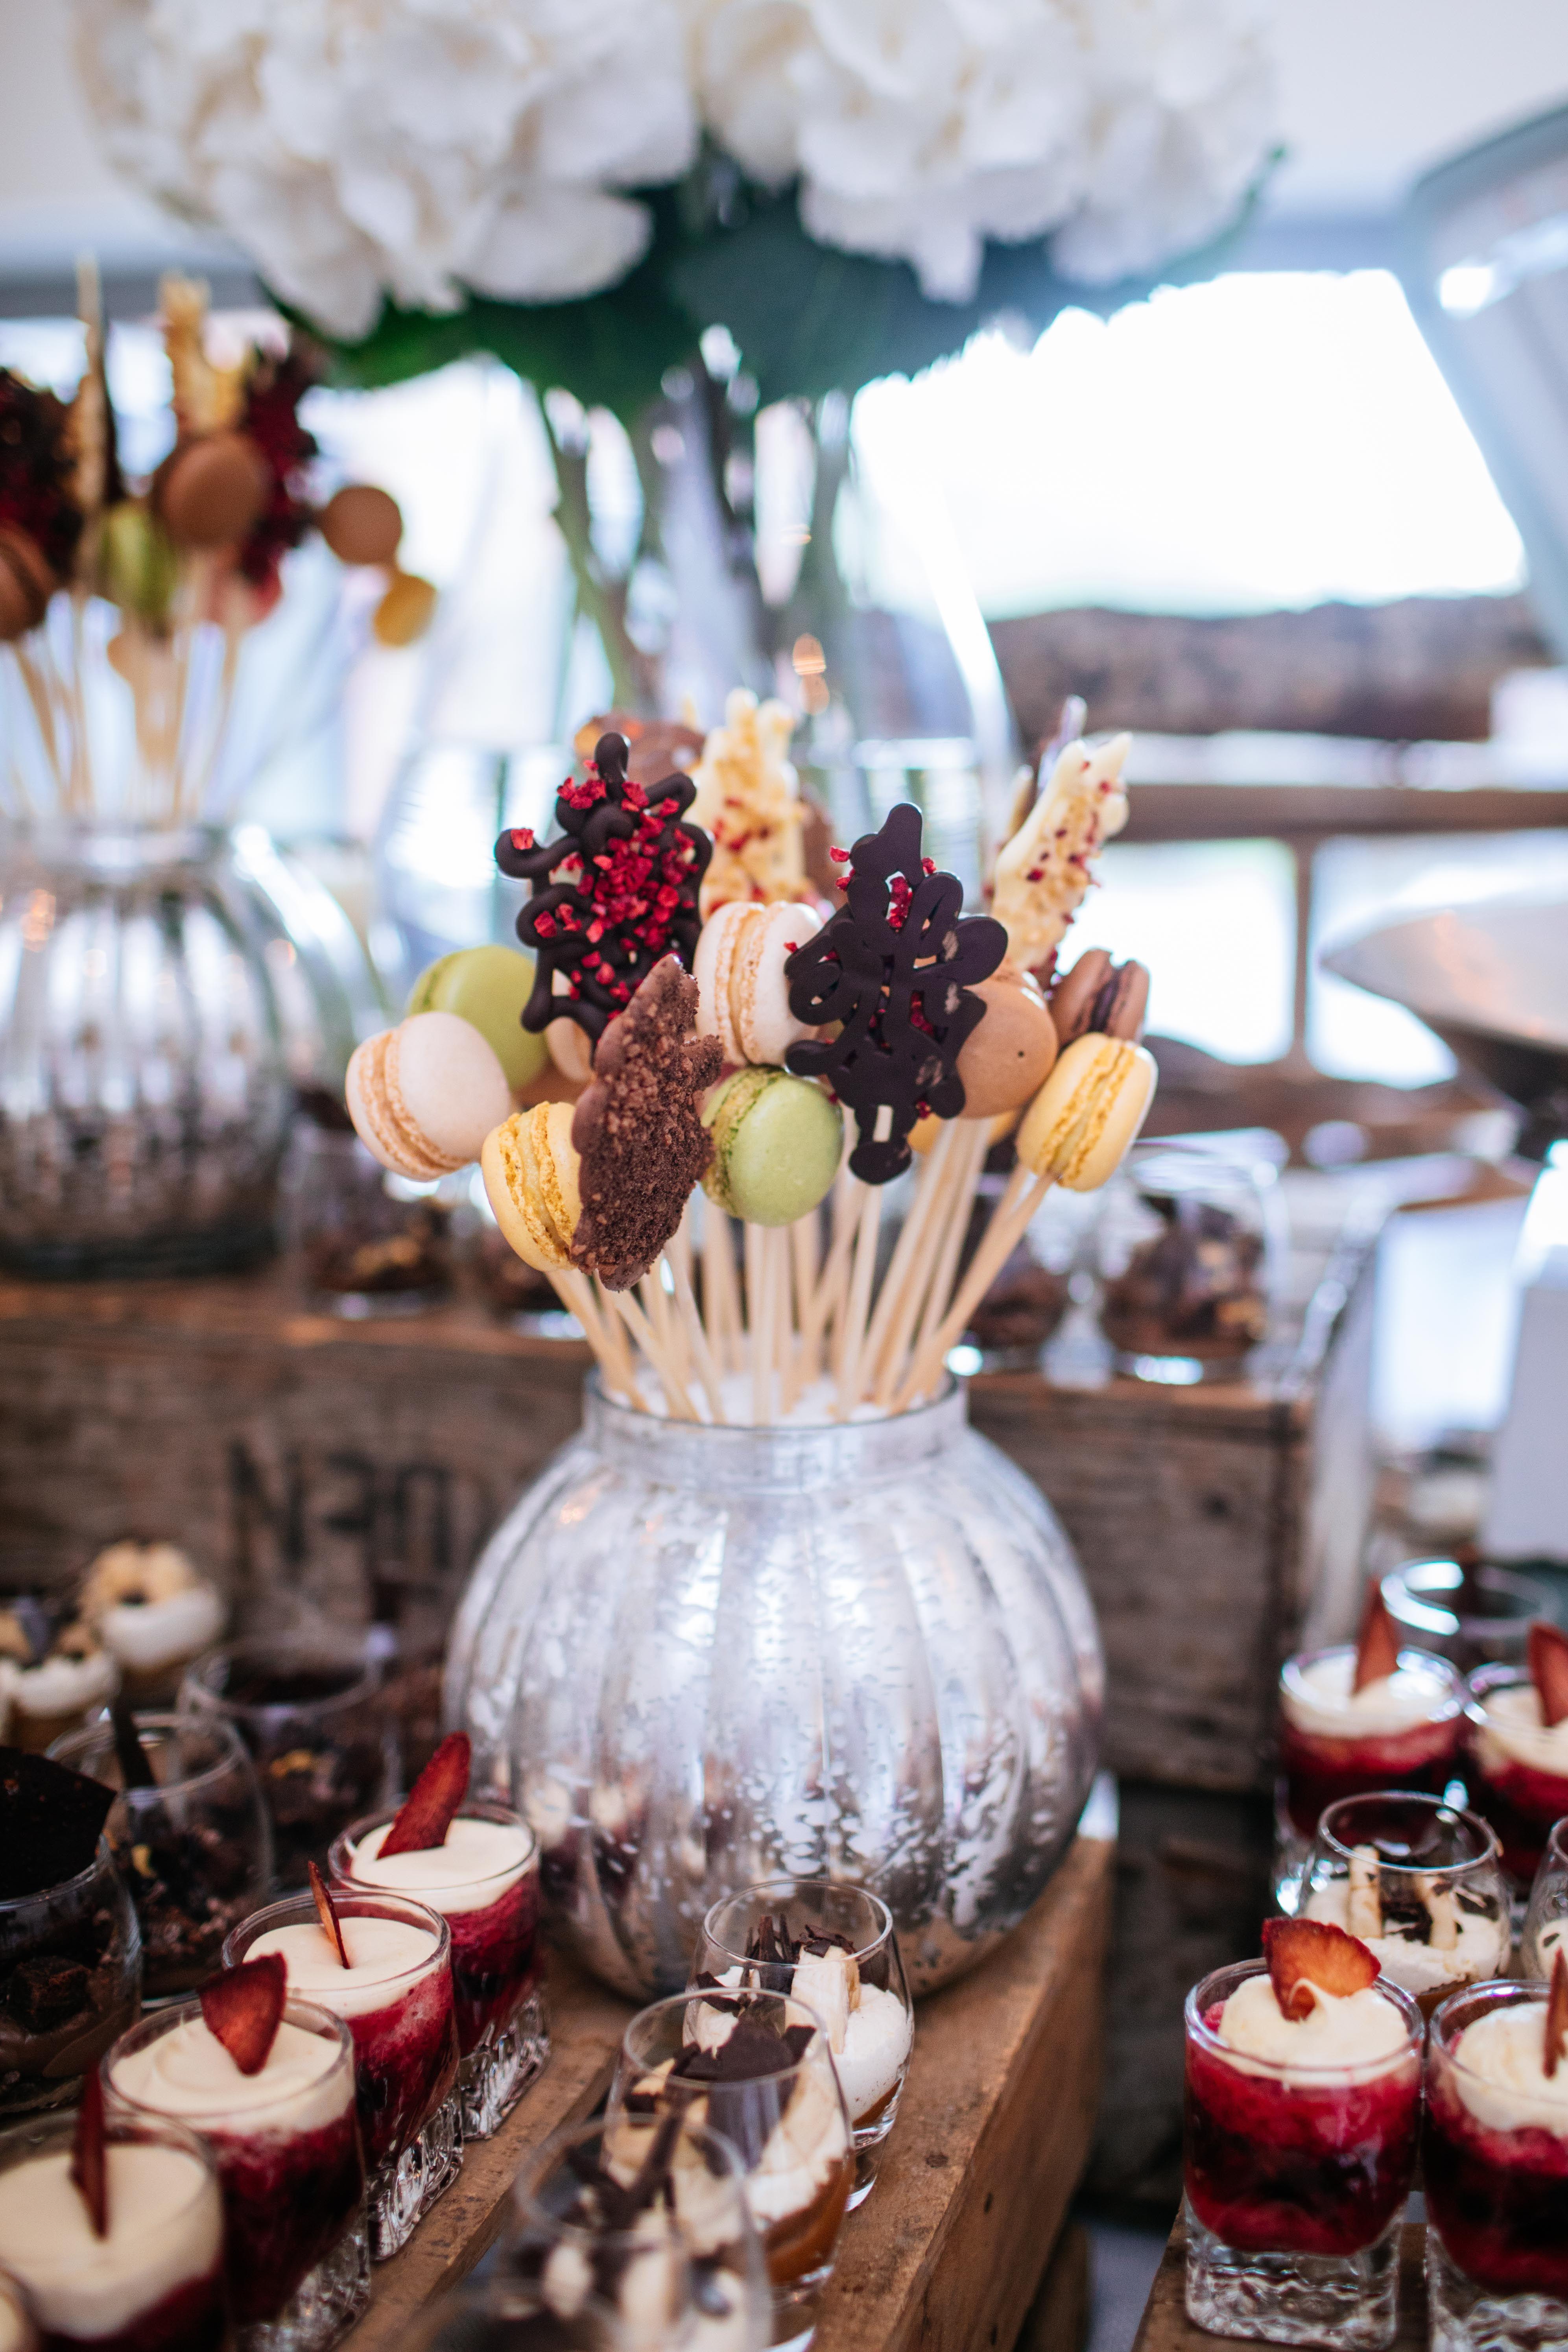 Millbridge Court, Exclusive Use Wedding Barn Venue, Surrey -   16 rustic desserts Plating ideas